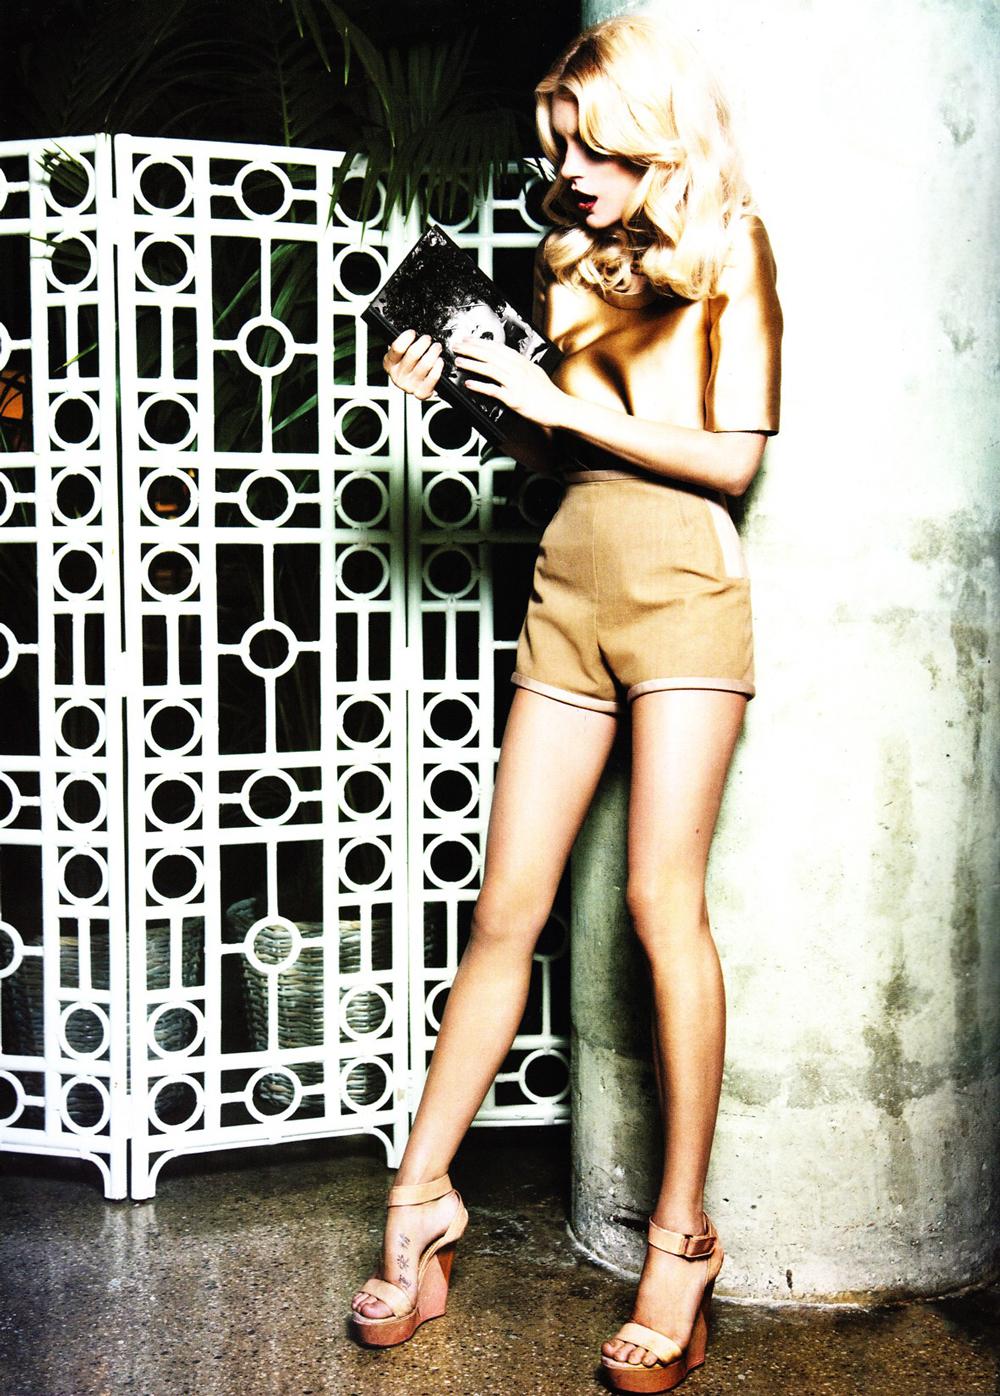 Jessica Stam in Lanvin by Alber Elbaz in Dangerous Liaisons / Vogue China January 2011 (photography: Ellen von Unwerth, styling: Anne Christensen) via www.fashionedbylove.co.uk